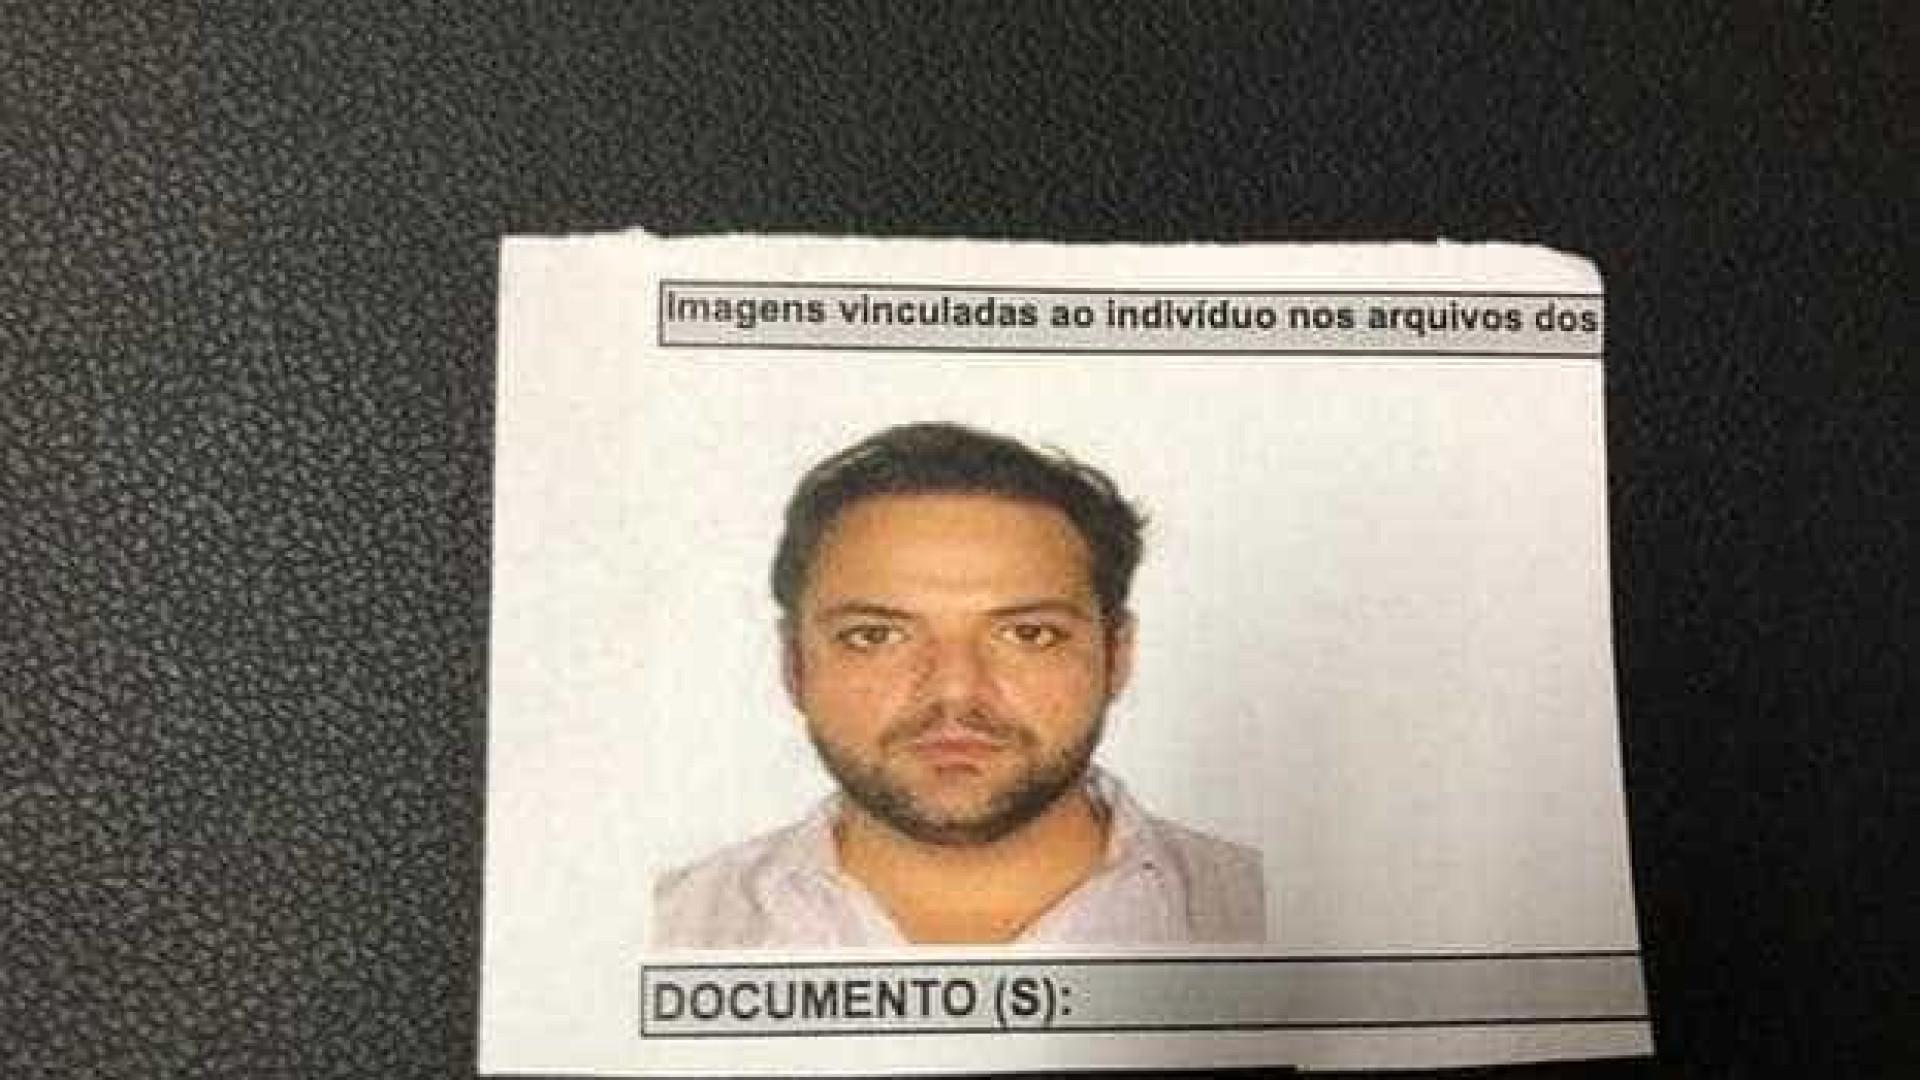 Médico é preso acusado de filmar partes íntimas de 105 pacientes